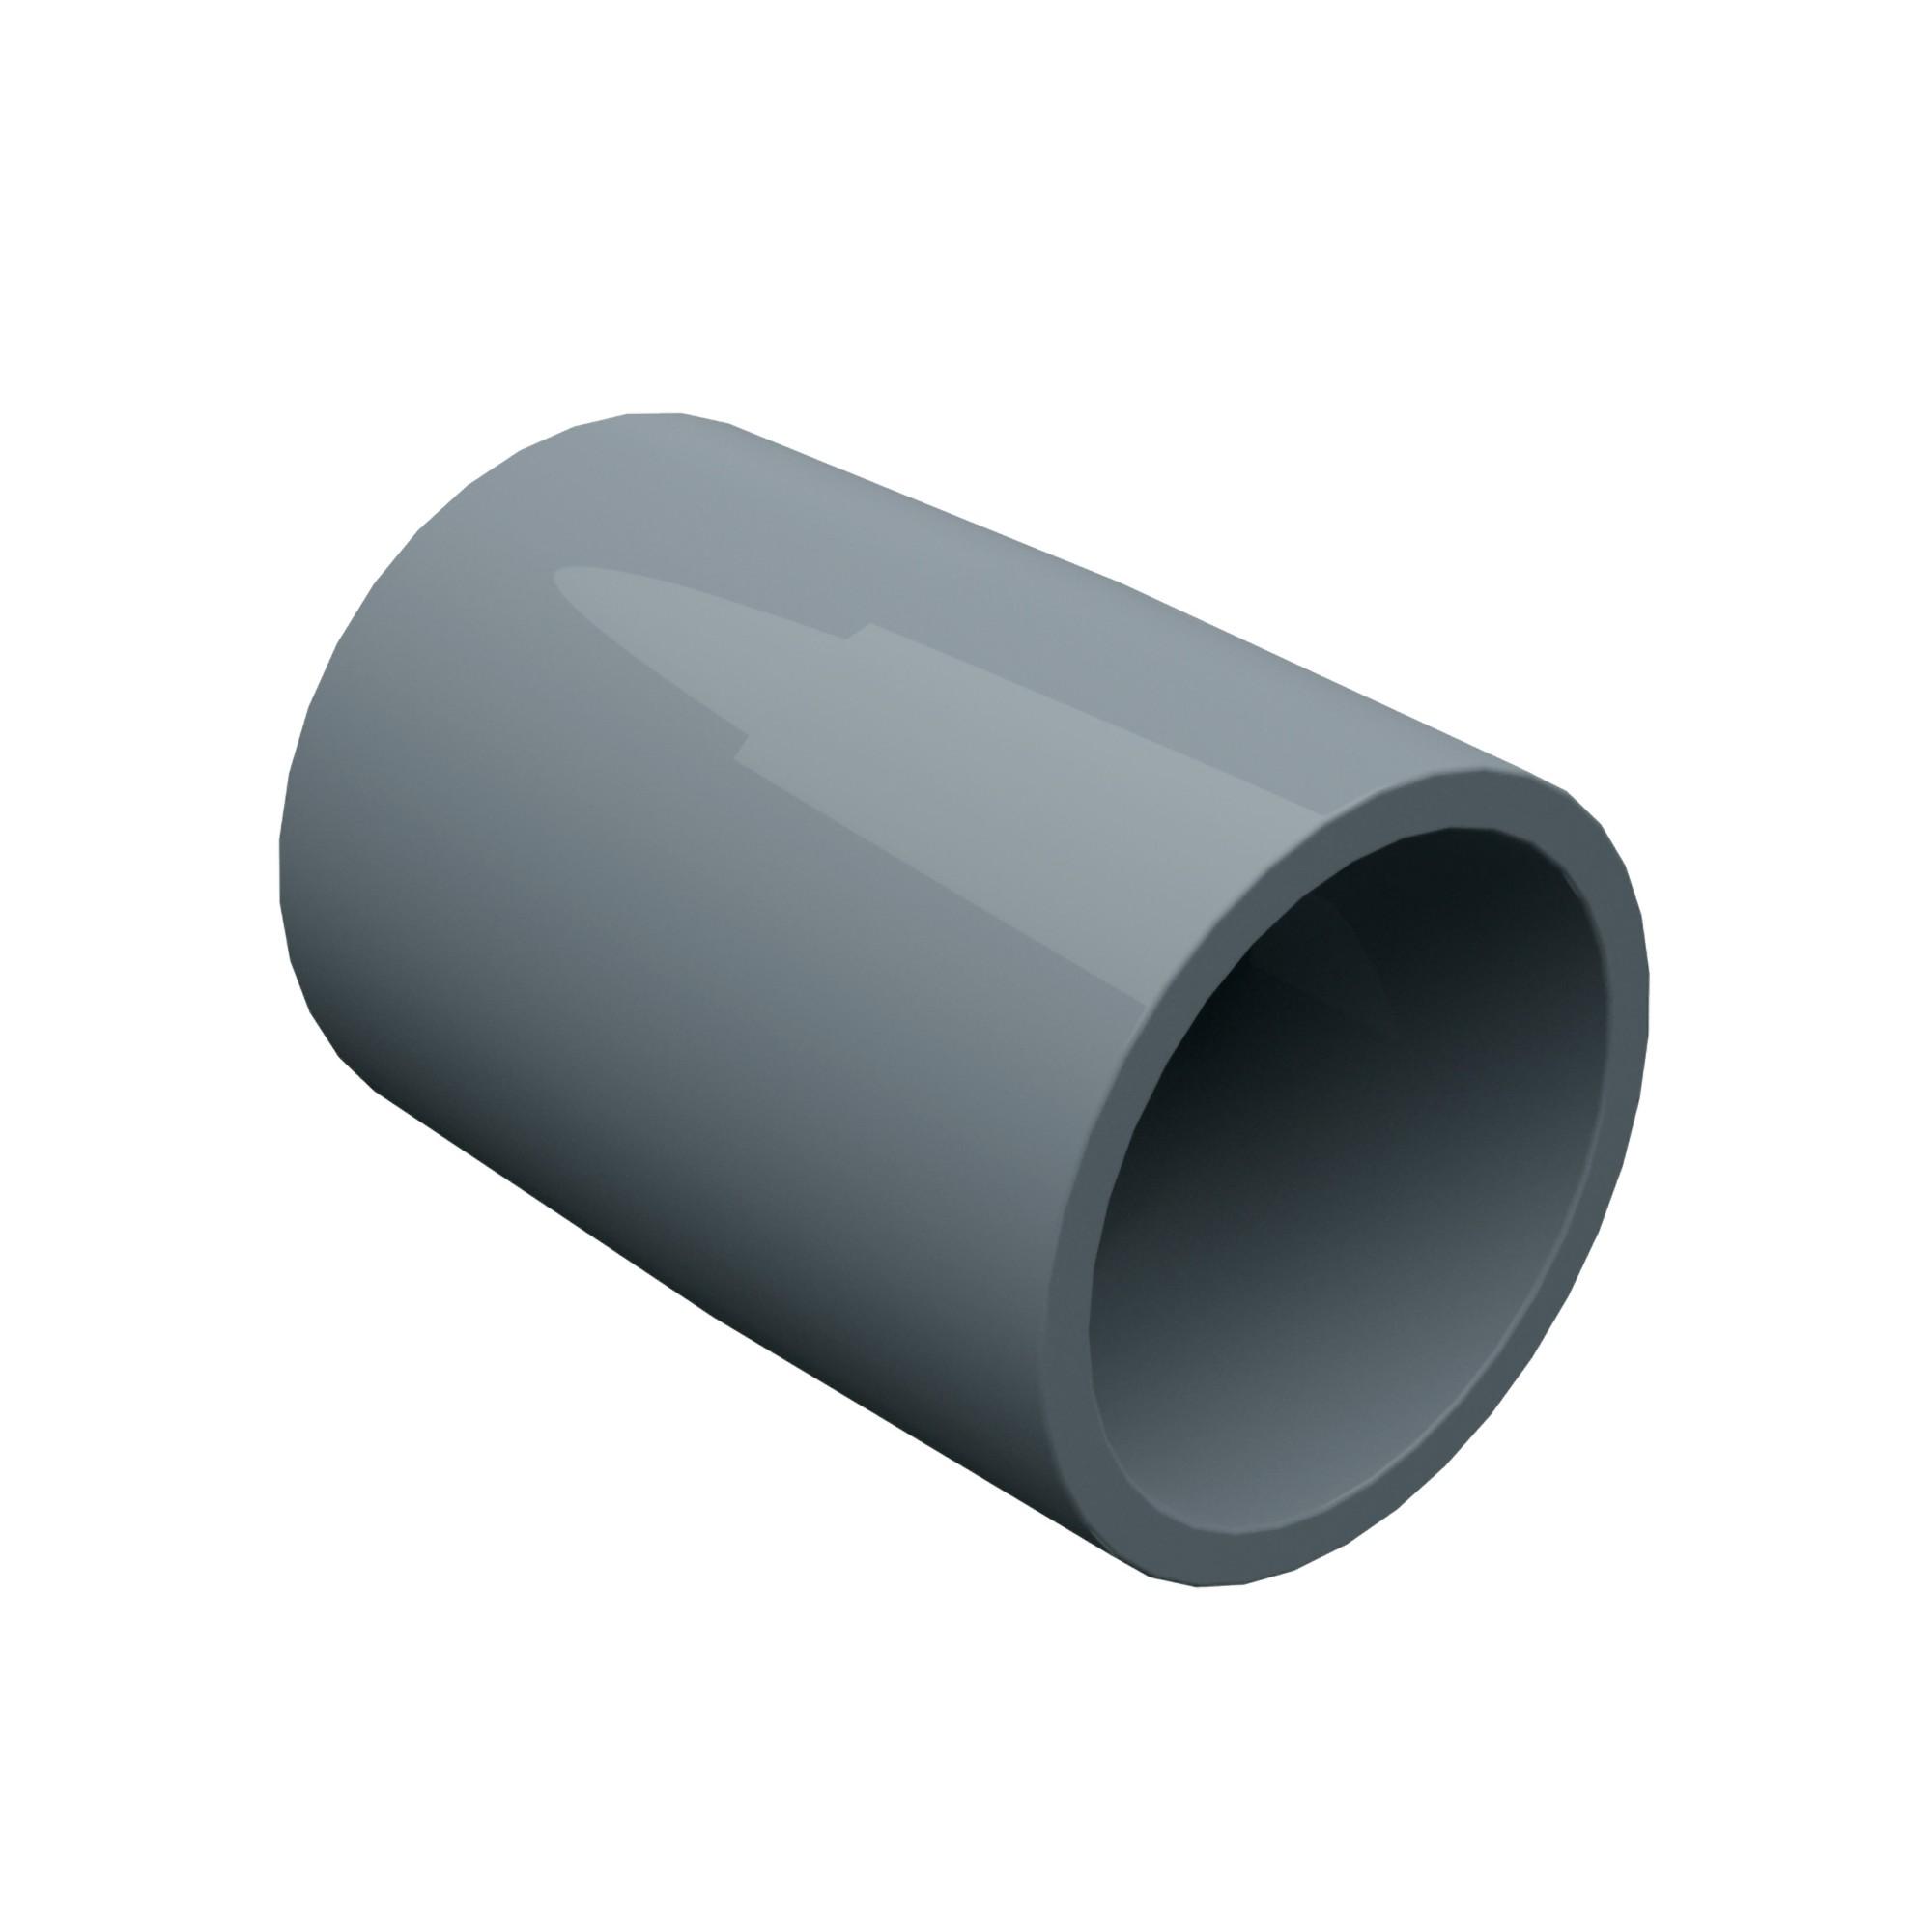 Luva Soldavel 1 PVC Antichamas Cinza - Tigre